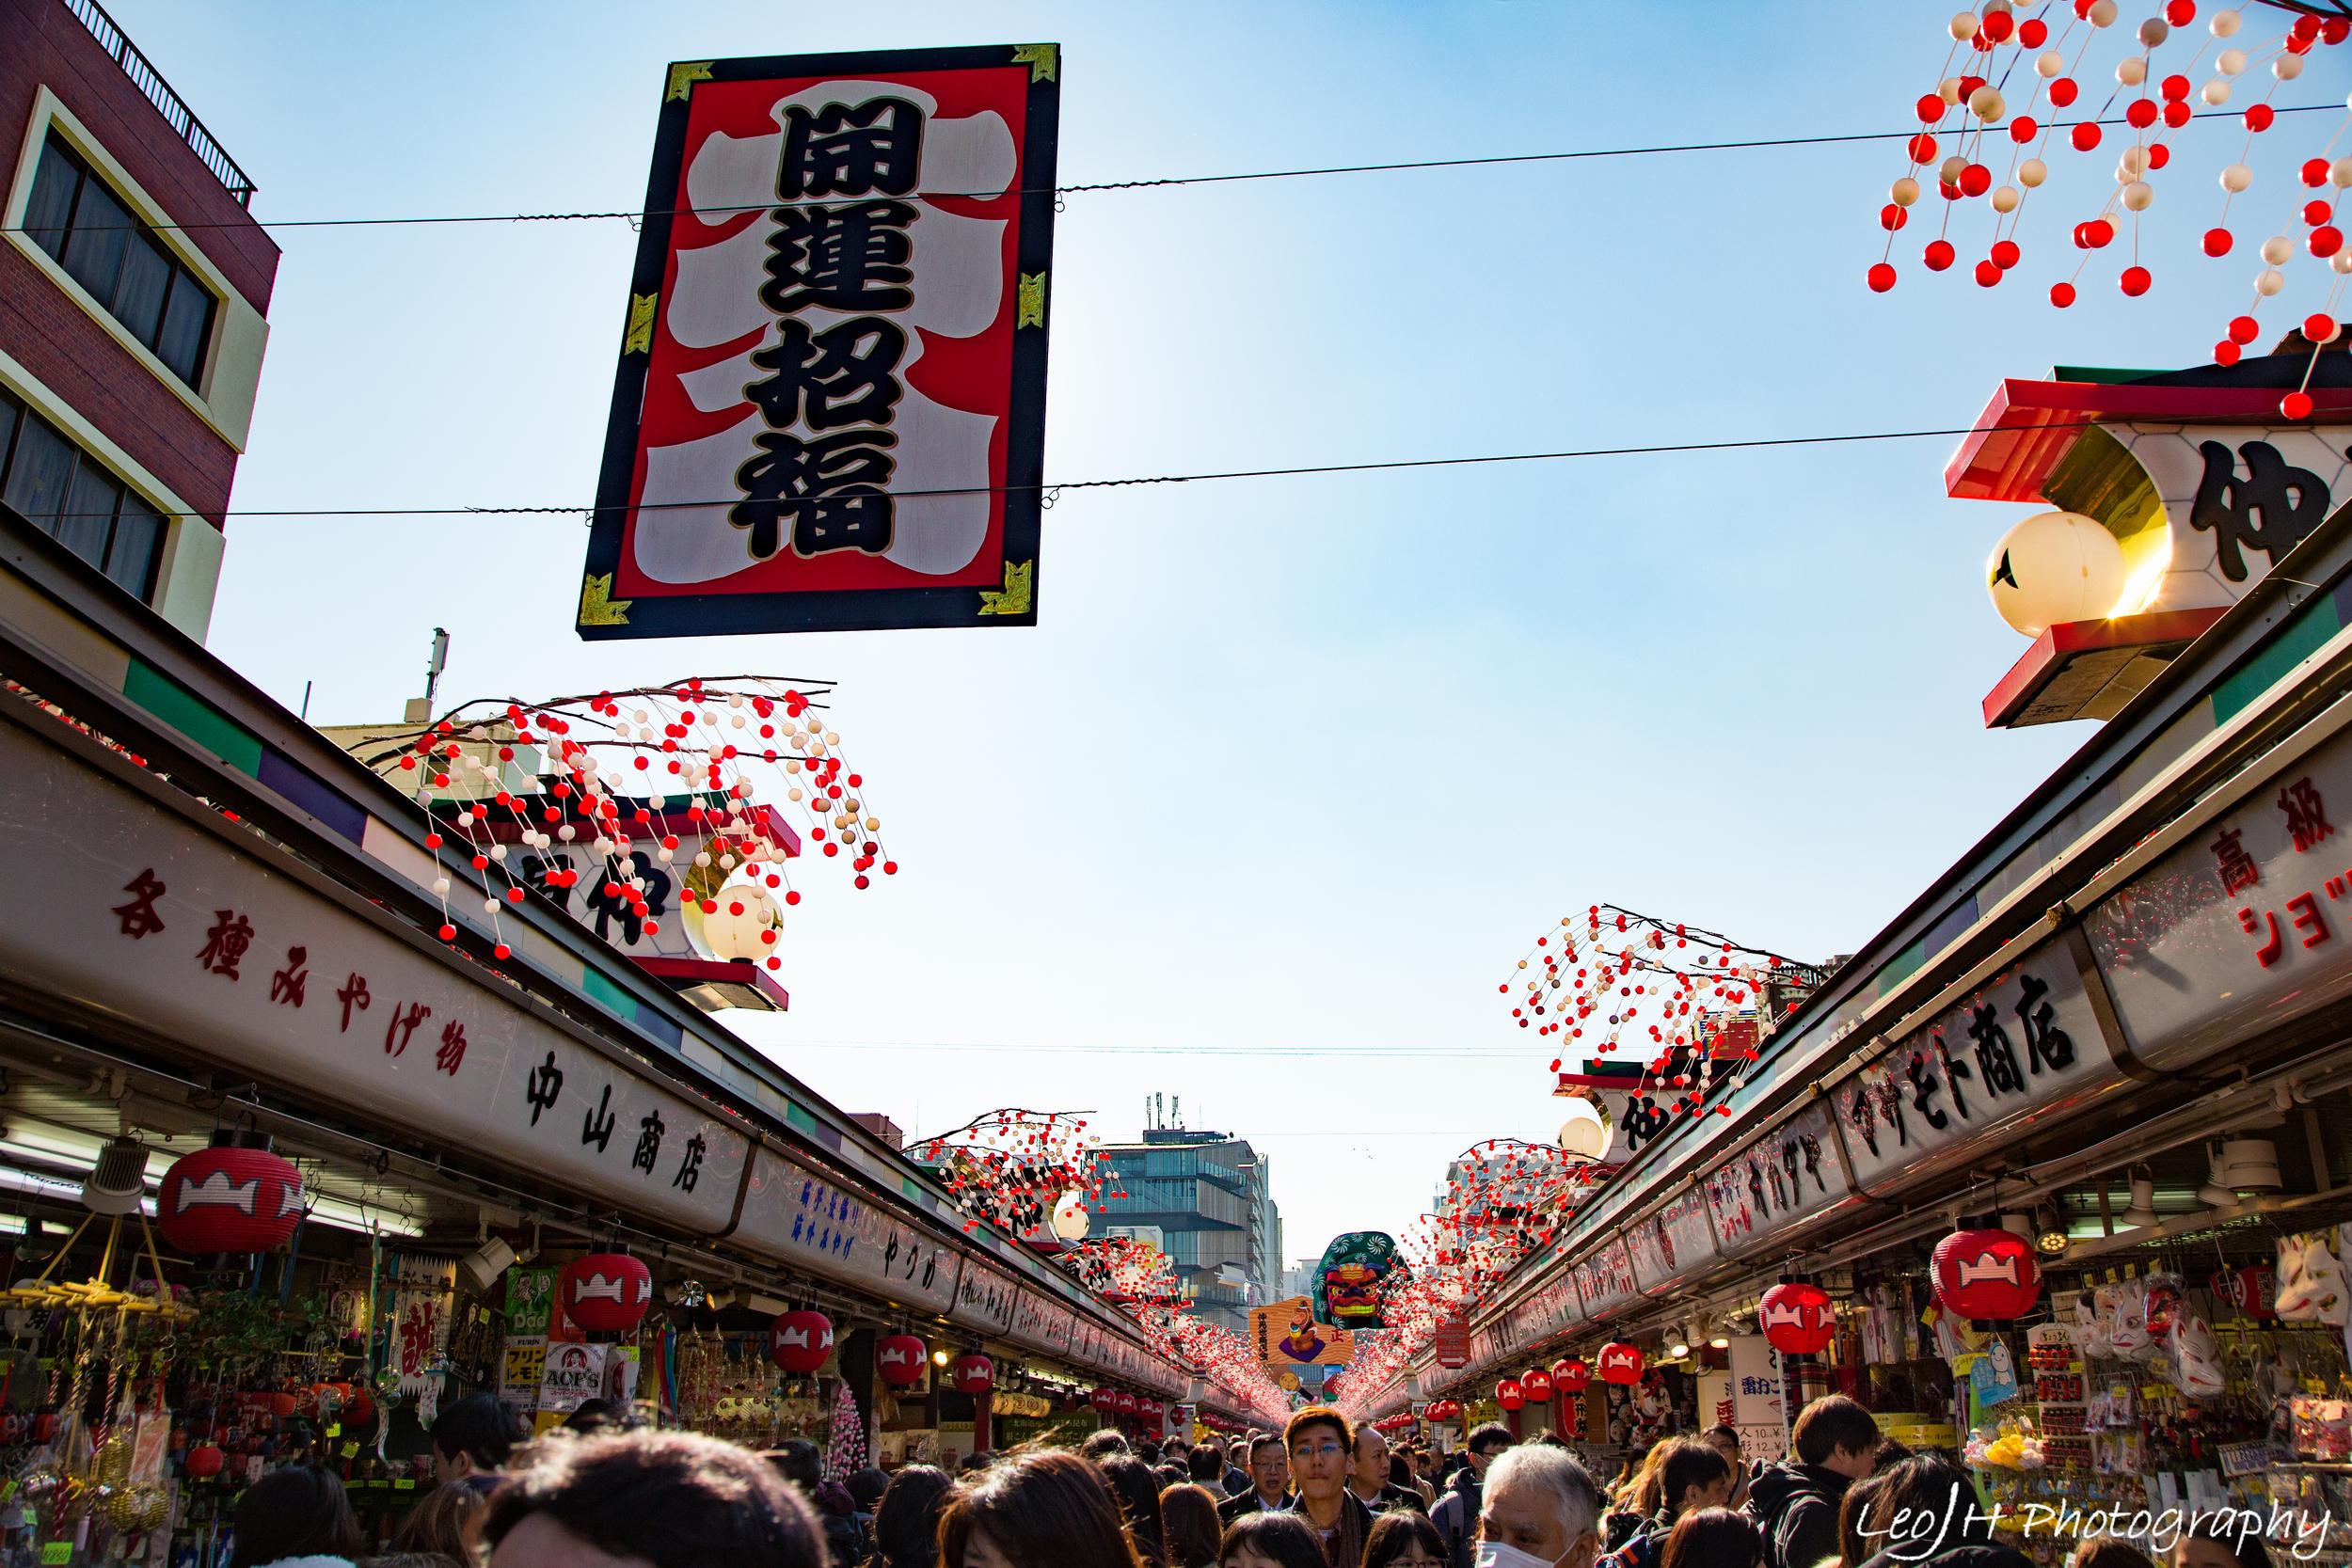 Shopping street to Senso-ji, Nakamise-dori